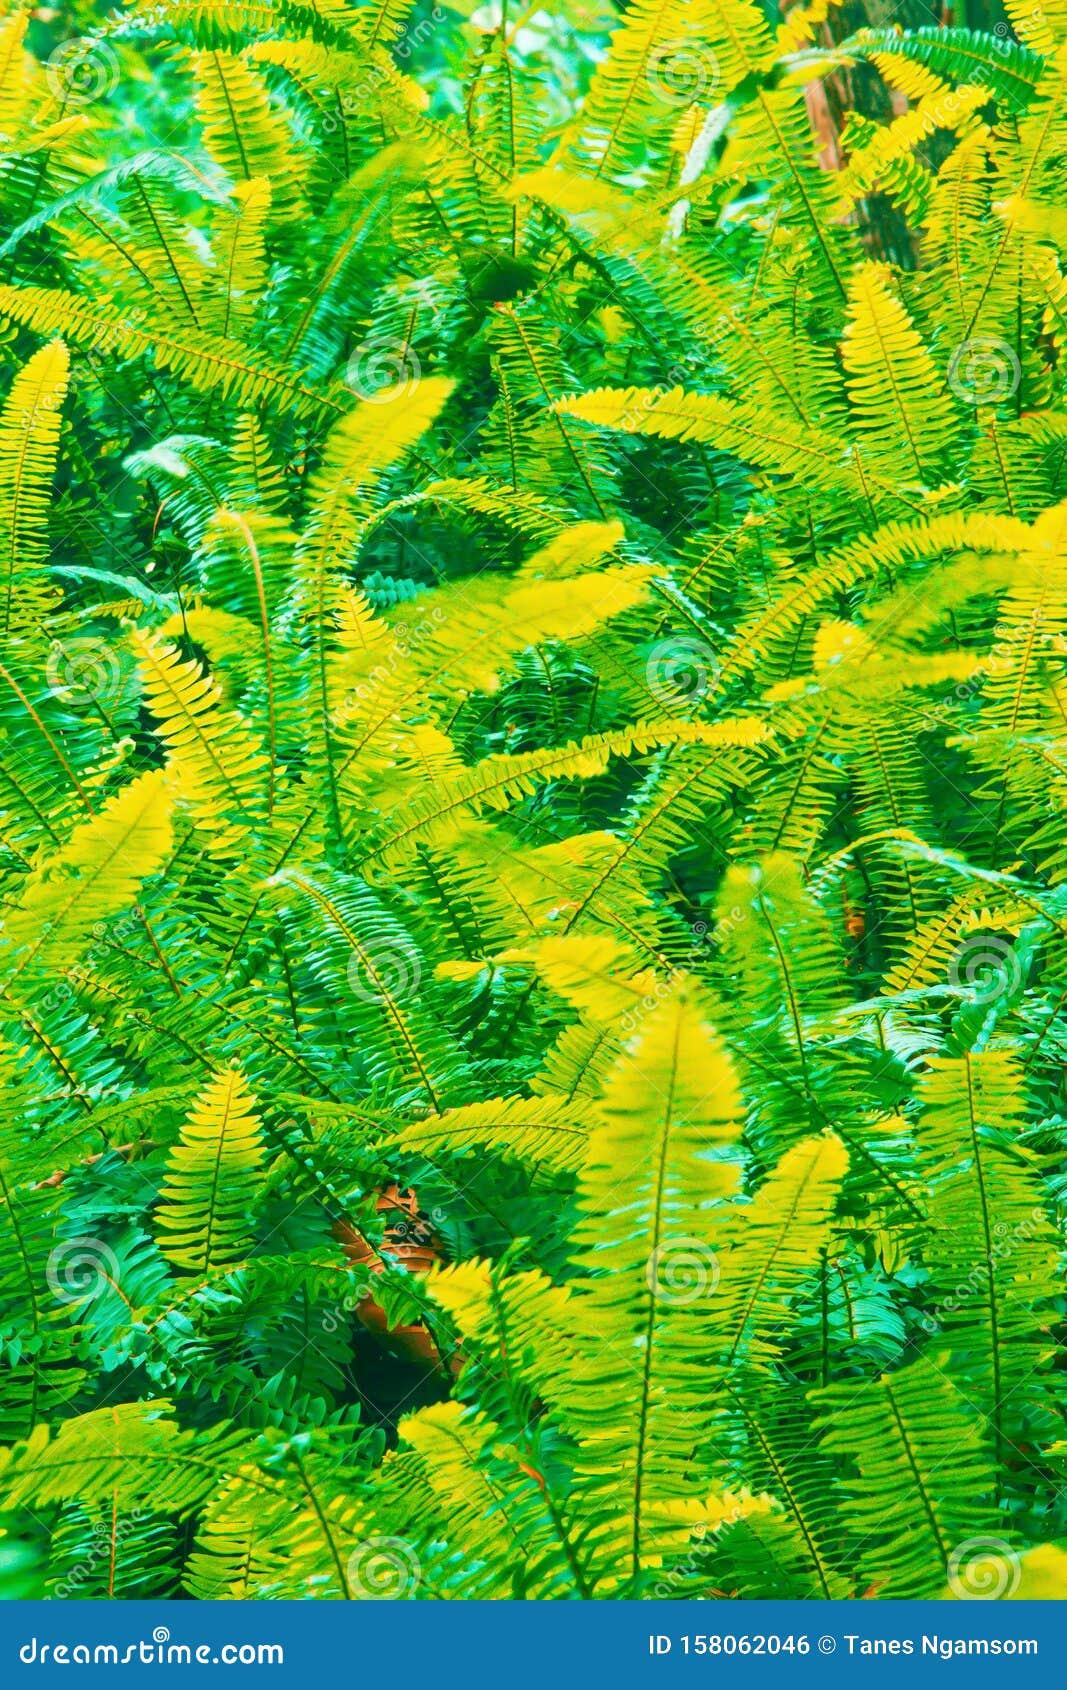 Fantastic colors of fern leaves